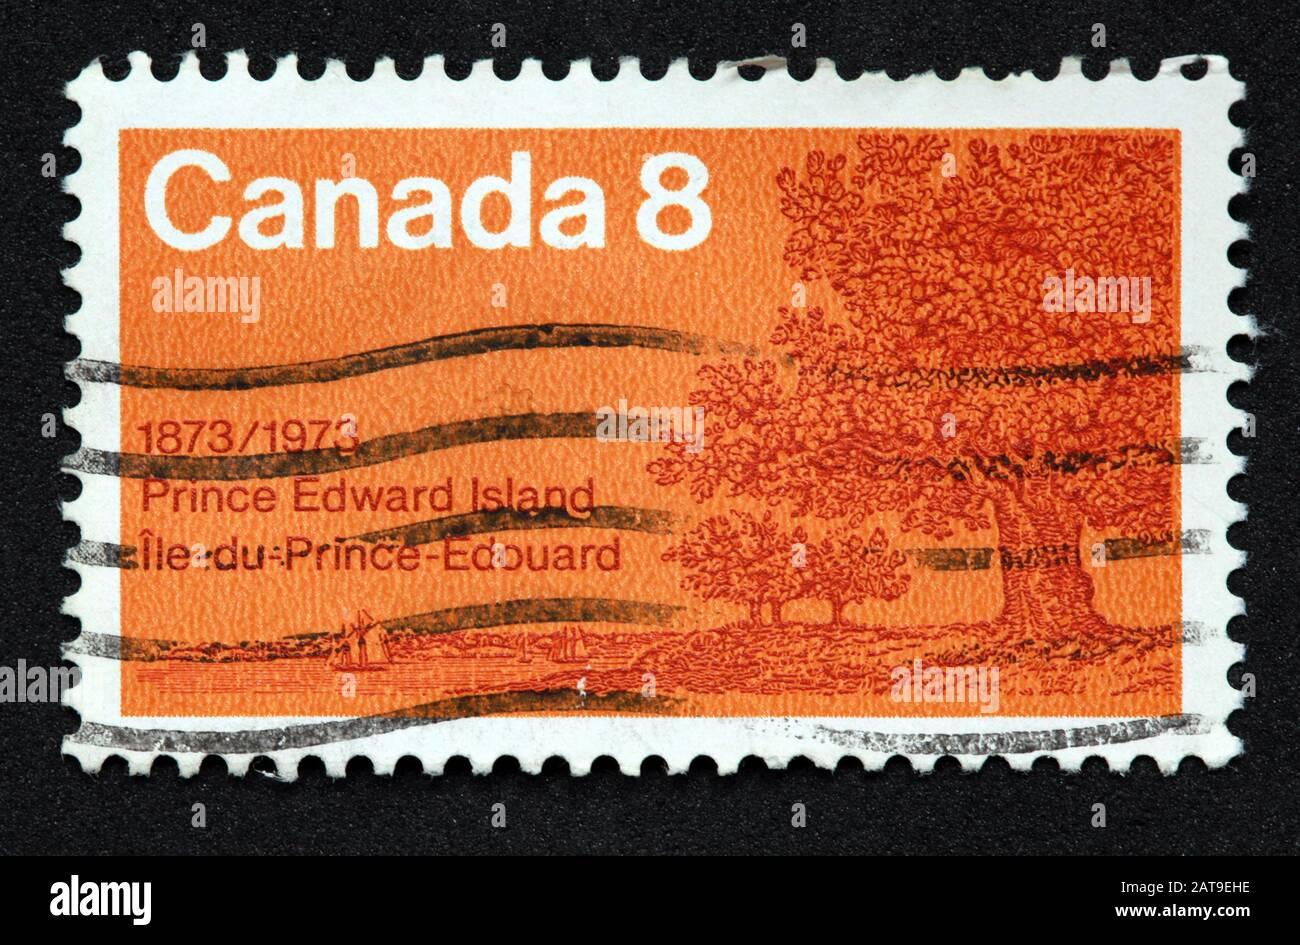 Hotpixuk,@Hotpixuk,GoTonySmith,stamp,postal,franked,frank,used stamps,used franked,used,franked stamp,from envelope,history,historic,old,poste,post office,communications,postage,sending letters,sending,parcels,historic stamp,Canada 8c,8cent,1873-1973,Orange,Orange Stamp,1873,1973,Prince Edward,Island,ile,du,prince-edouard,Canadian